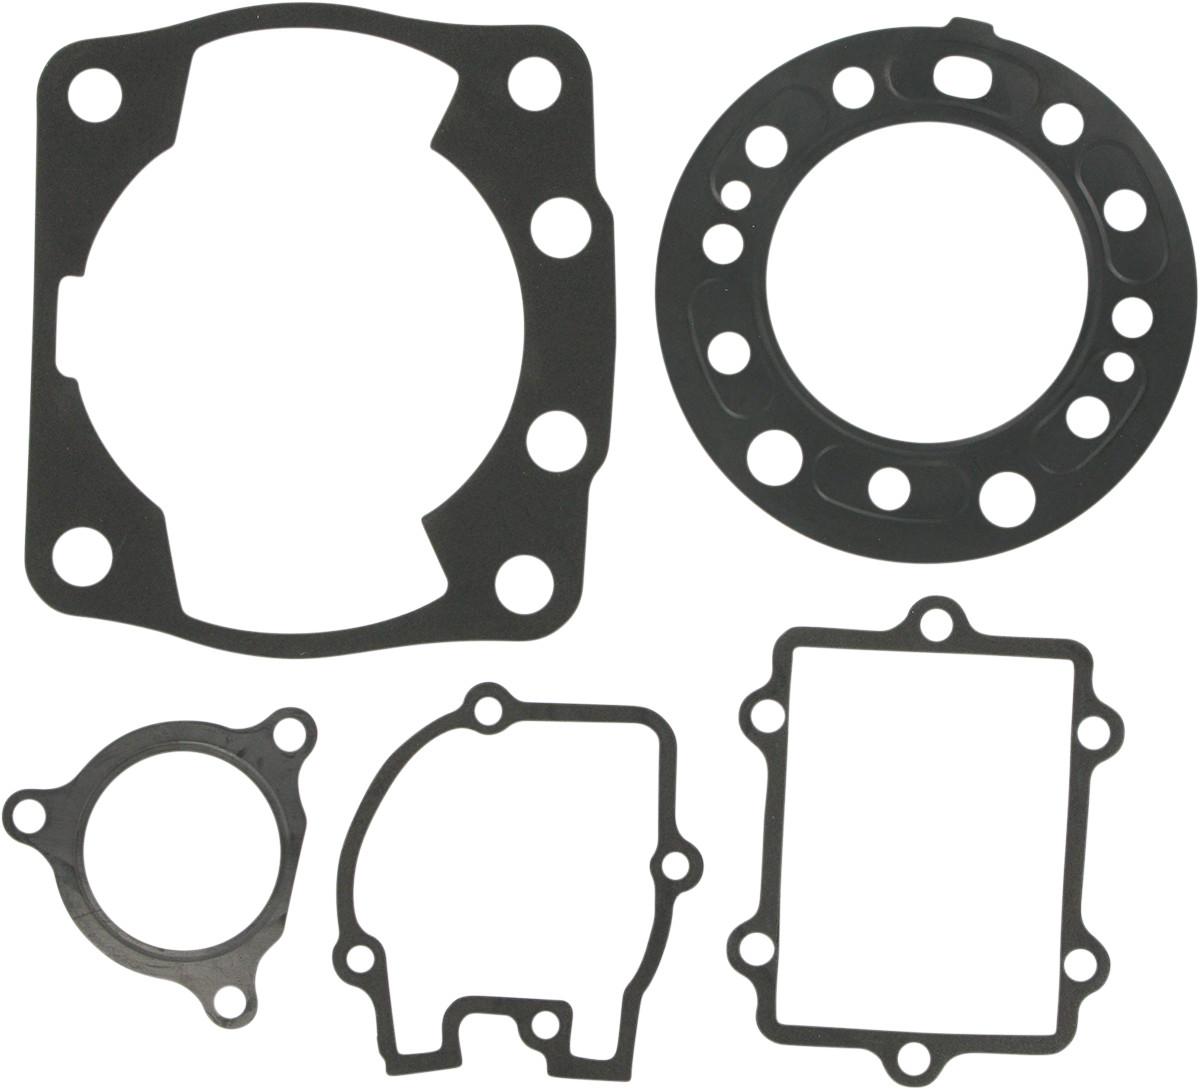 Cometic Top End Gasket Kit for Honda CR 250 02-04 68.5MM